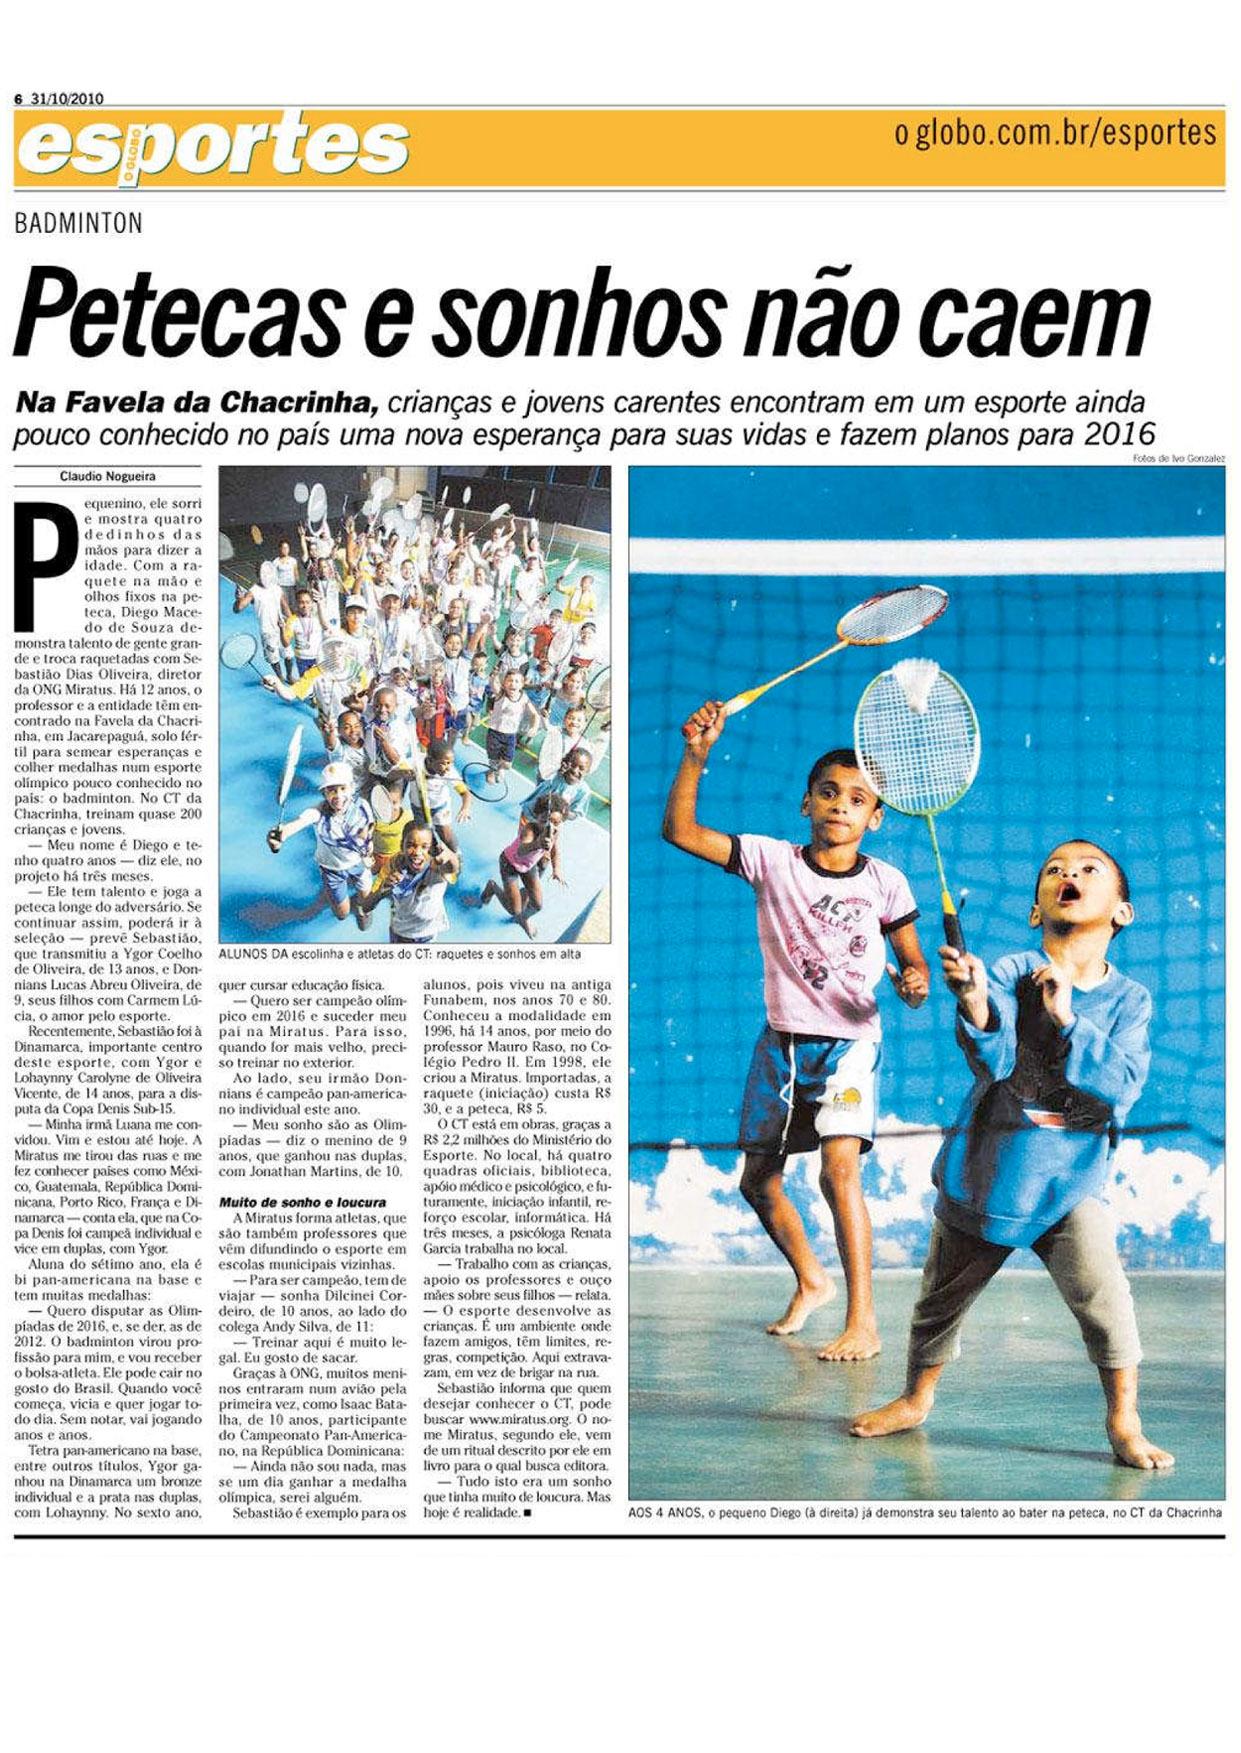 2010 10 31 Miratus Globo